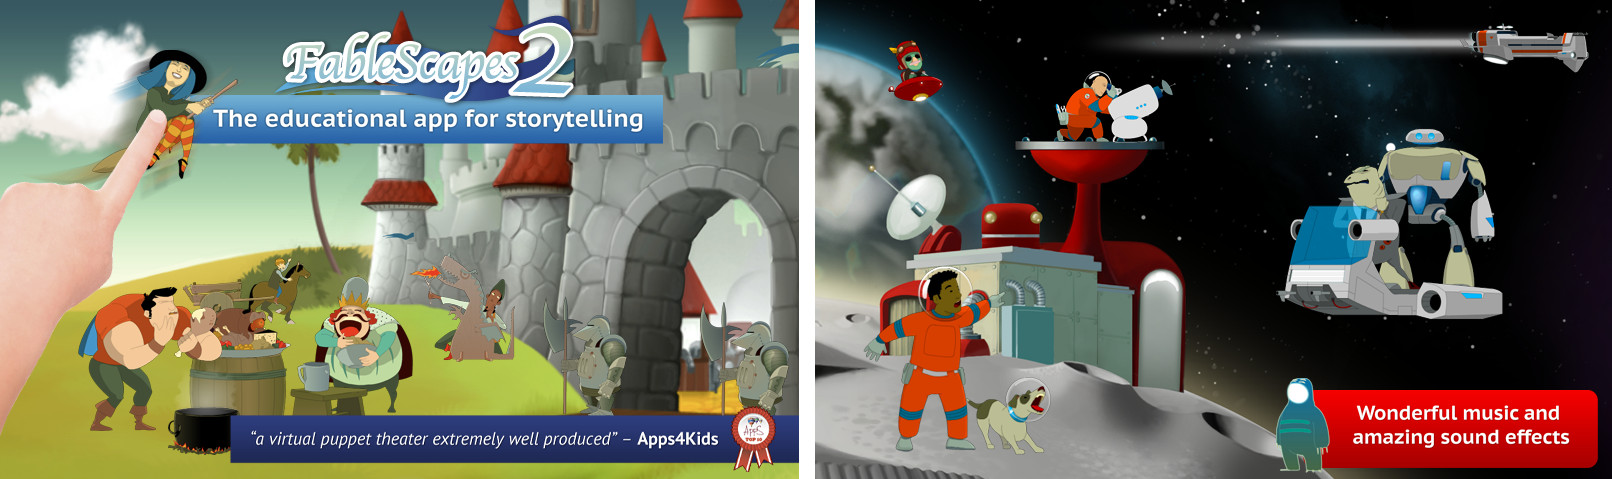 2014-12-16 14_08_38-FableScapes 2 - Android aplikacije na Google Playu8